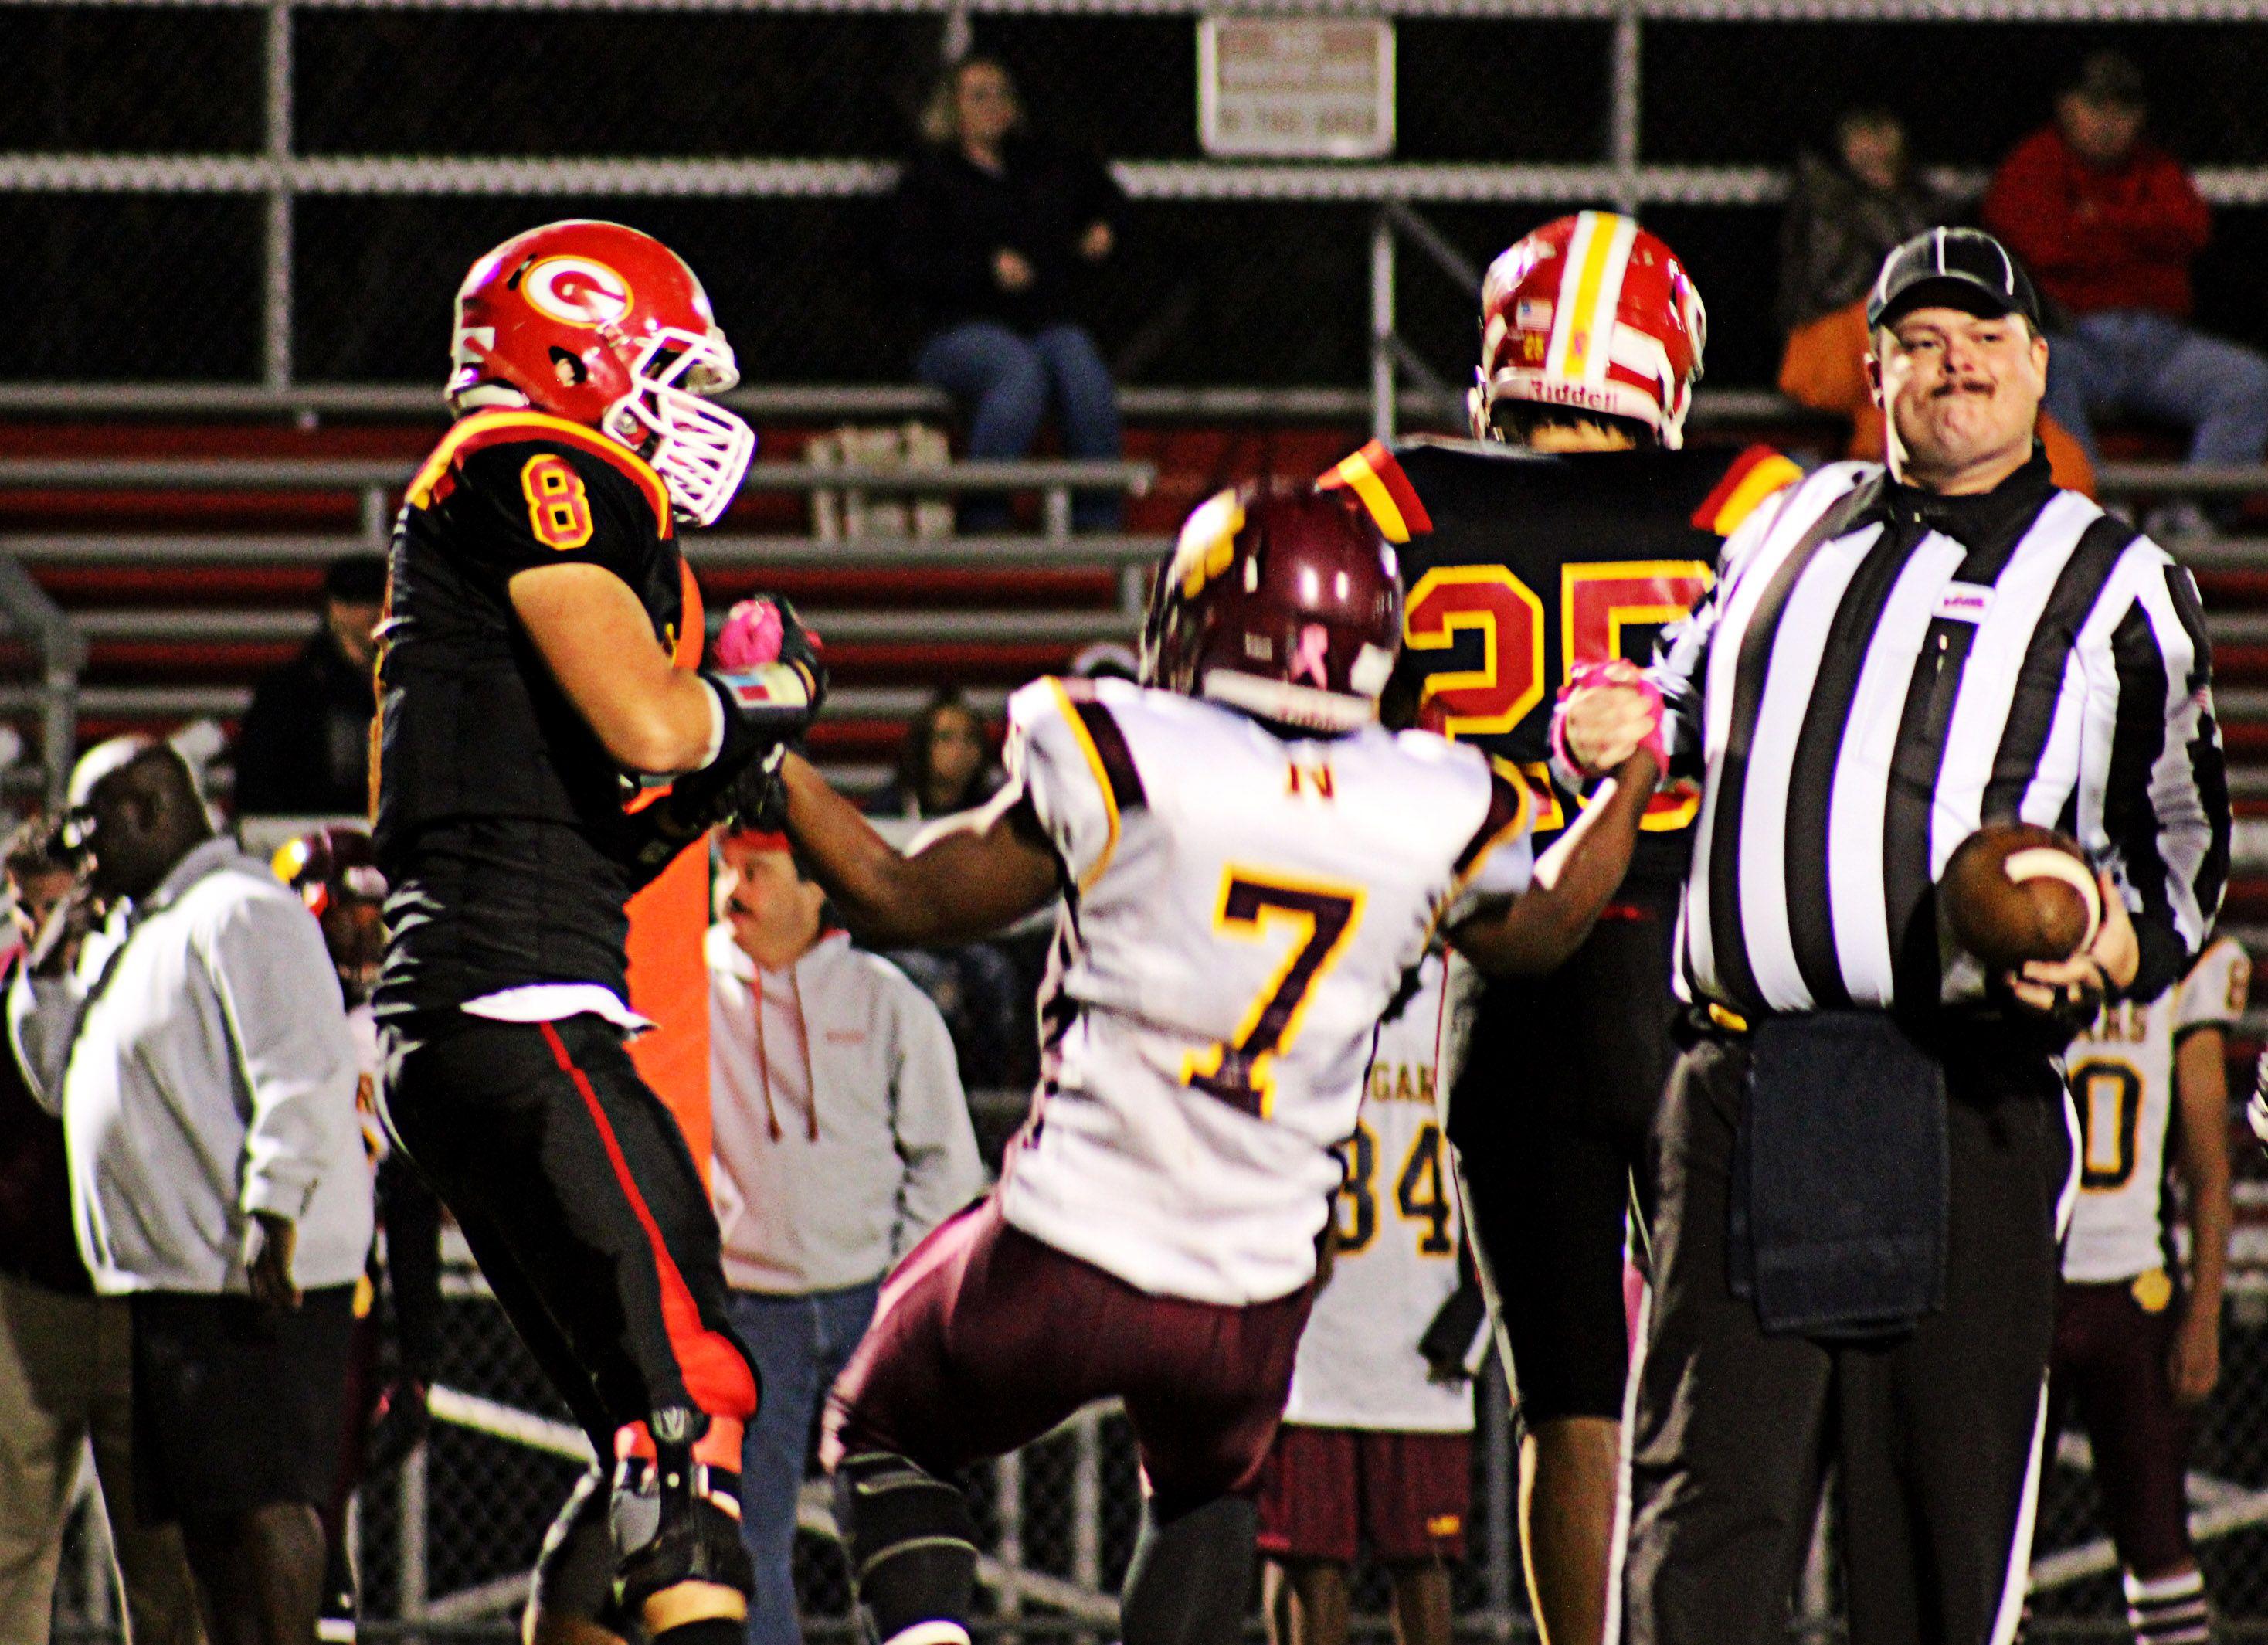 High School Football, Goochland Bulldogs. Friday Night